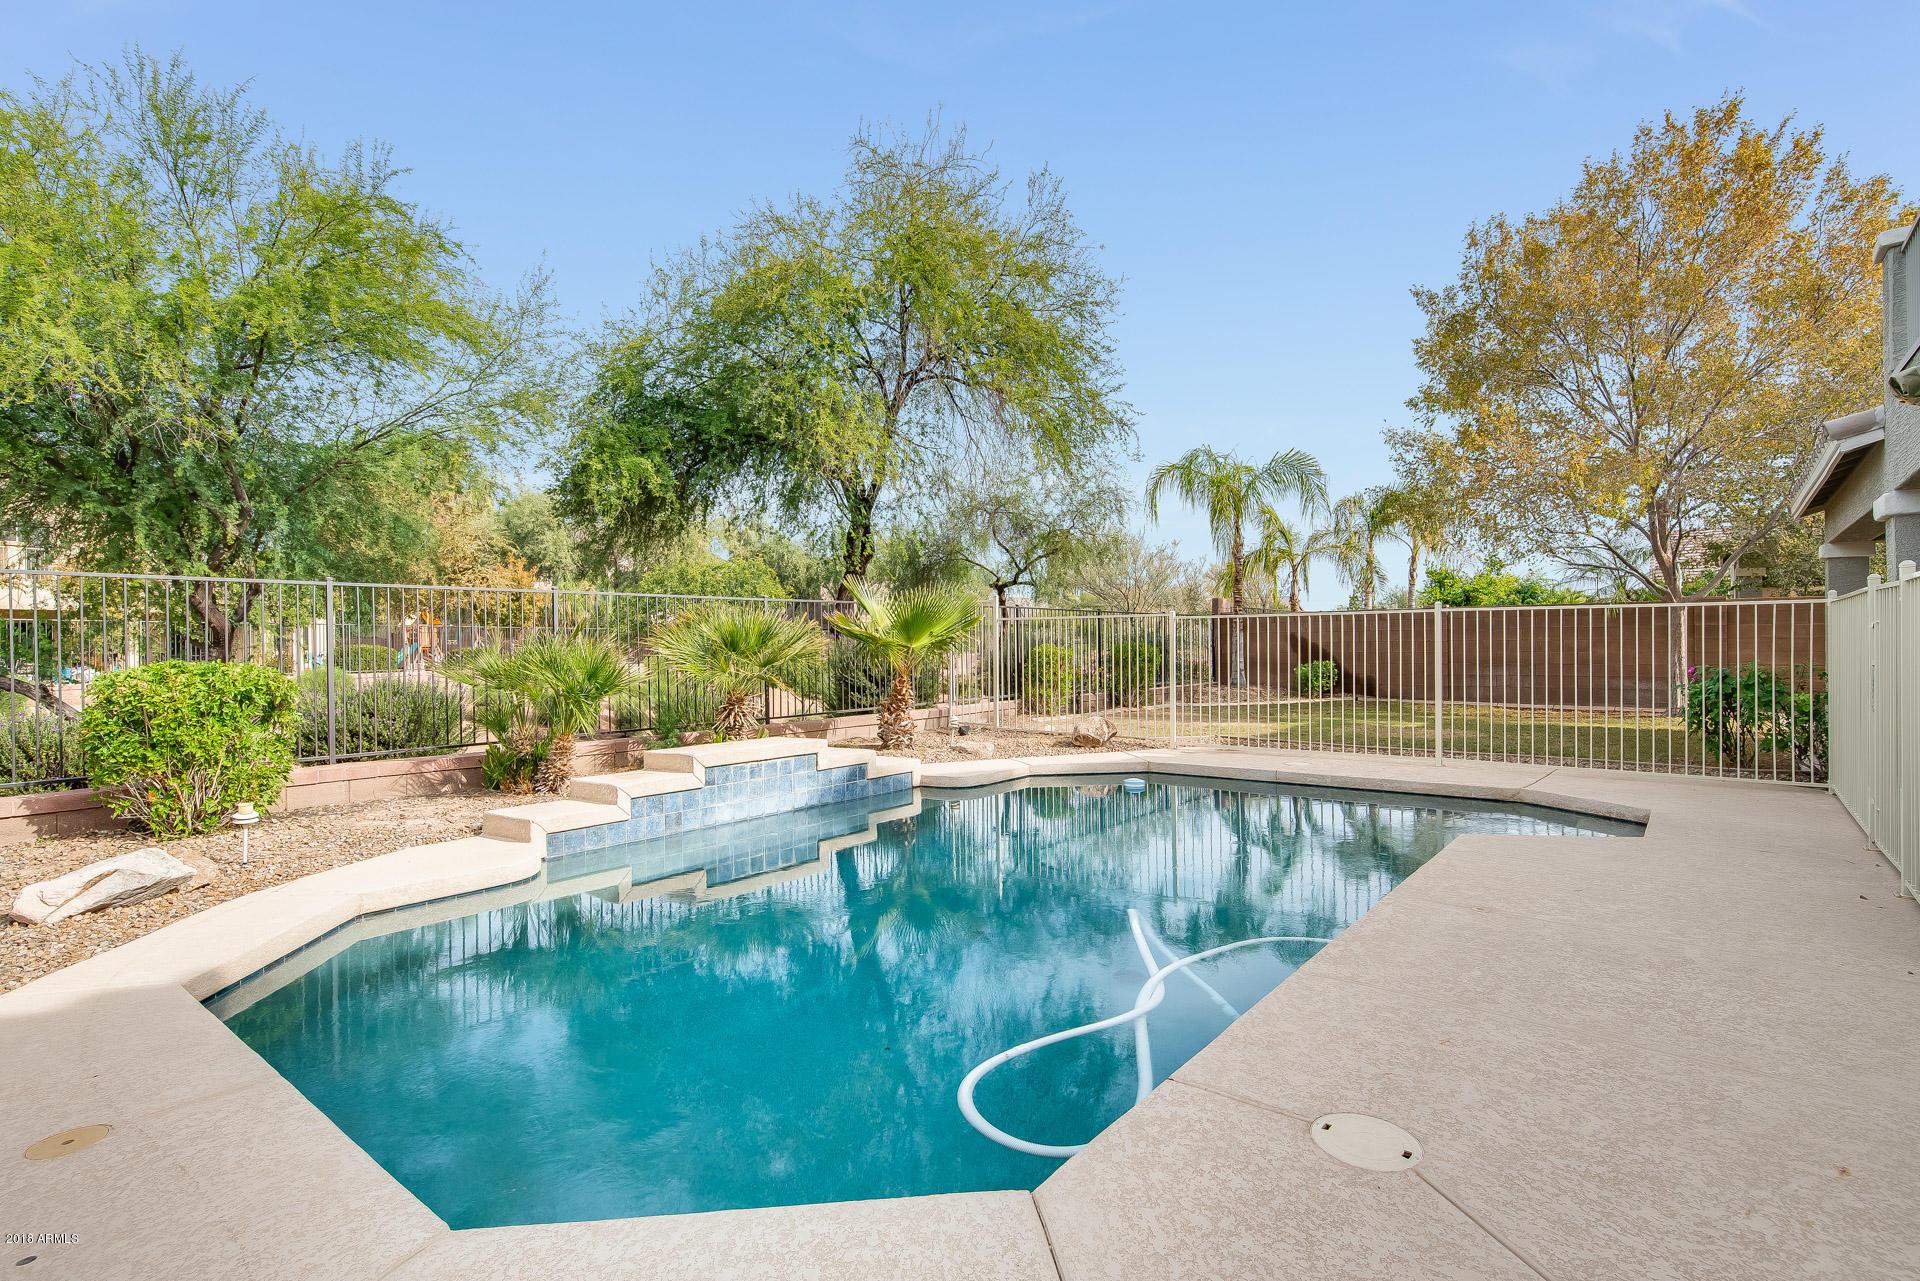 MLS 5849708 2994 E VERNON Street, Gilbert, AZ 85298 Gilbert AZ Shamrock Estates